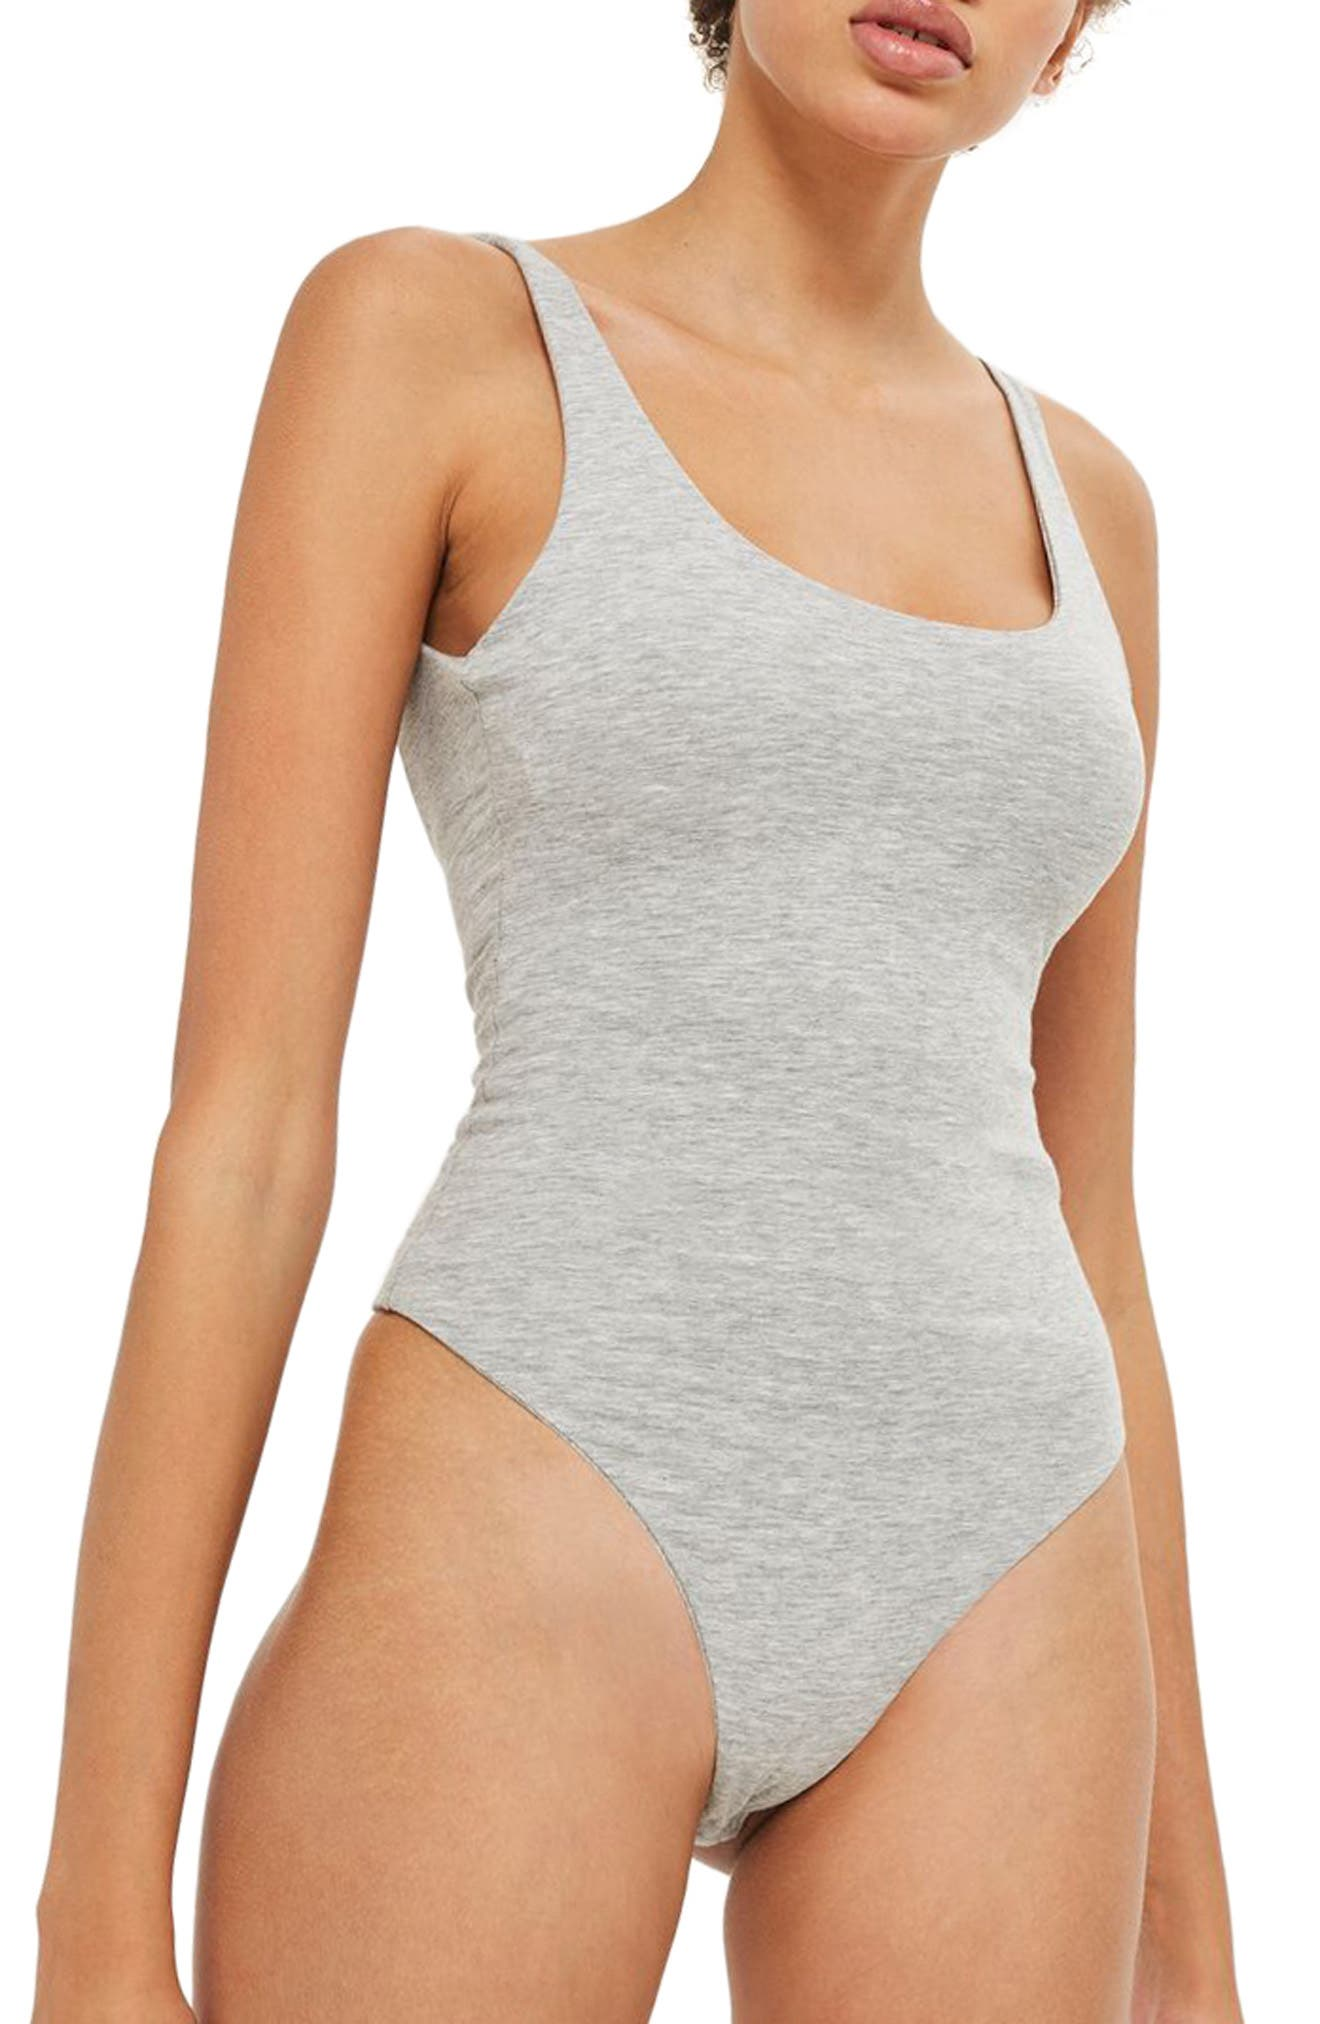 Alternate Image 1 Selected - Topshop Scoop Back Thong Bodysuit